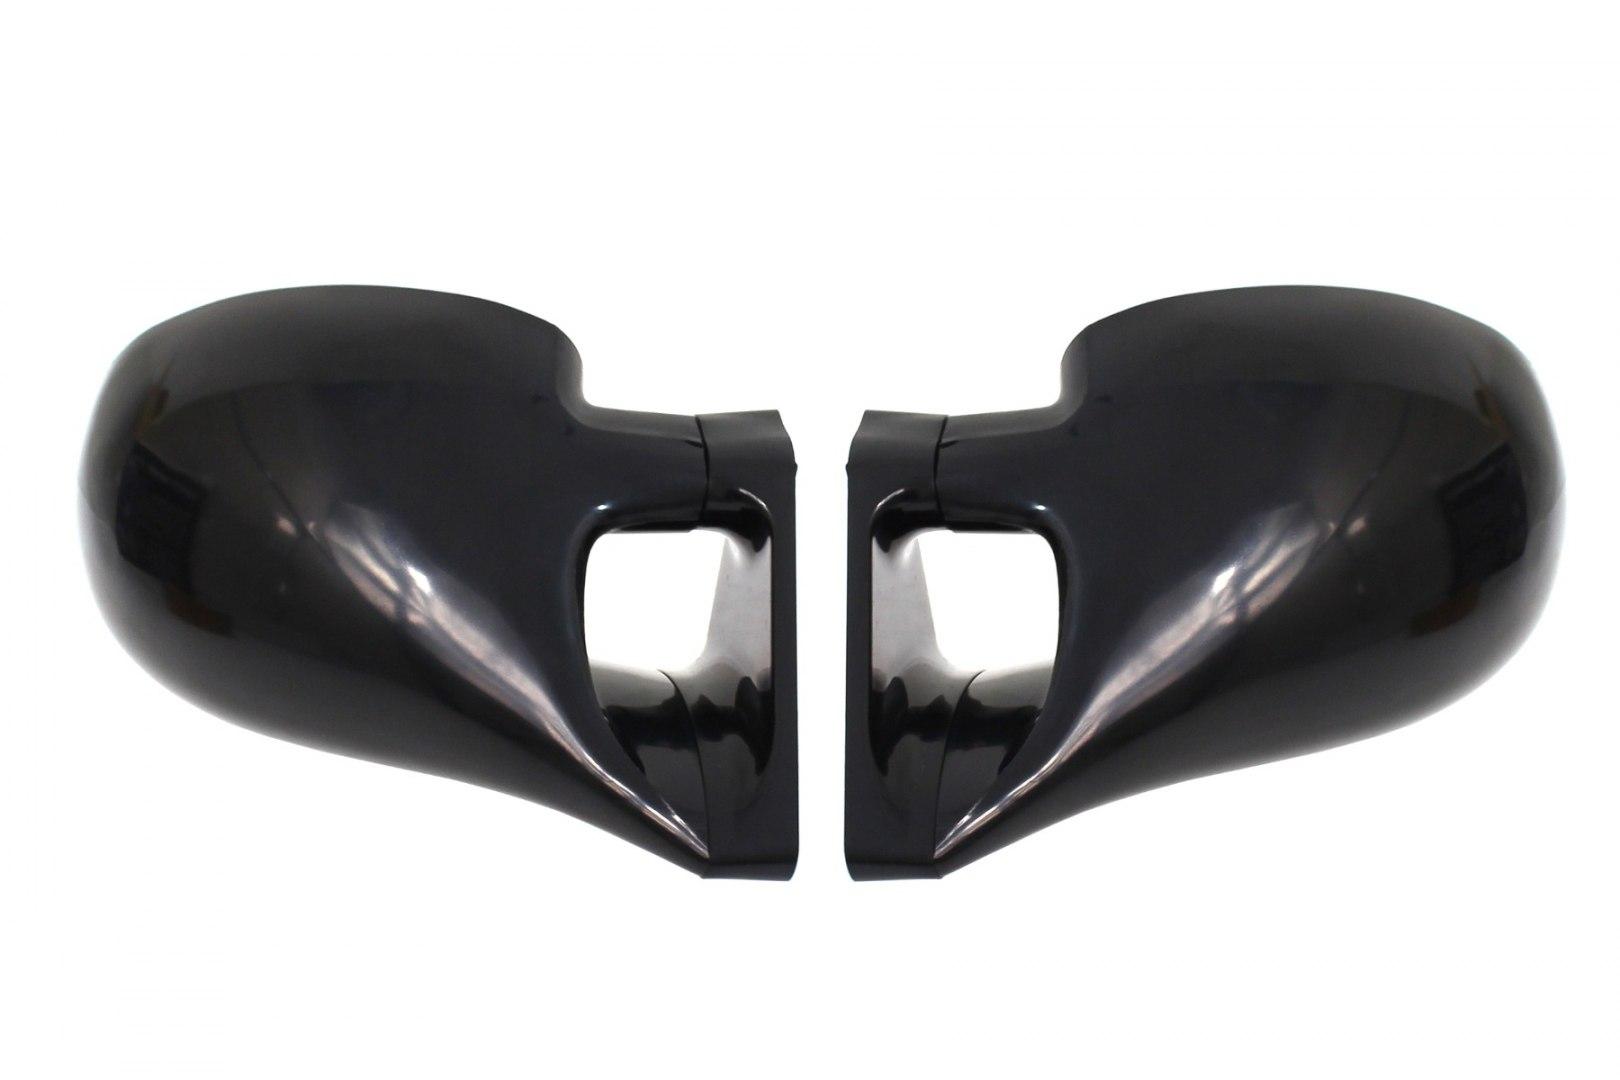 Lusterka Uniwersalne M3 Look Sport ABS Black Manual Blue Glass - GRUBYGARAGE - Sklep Tuningowy